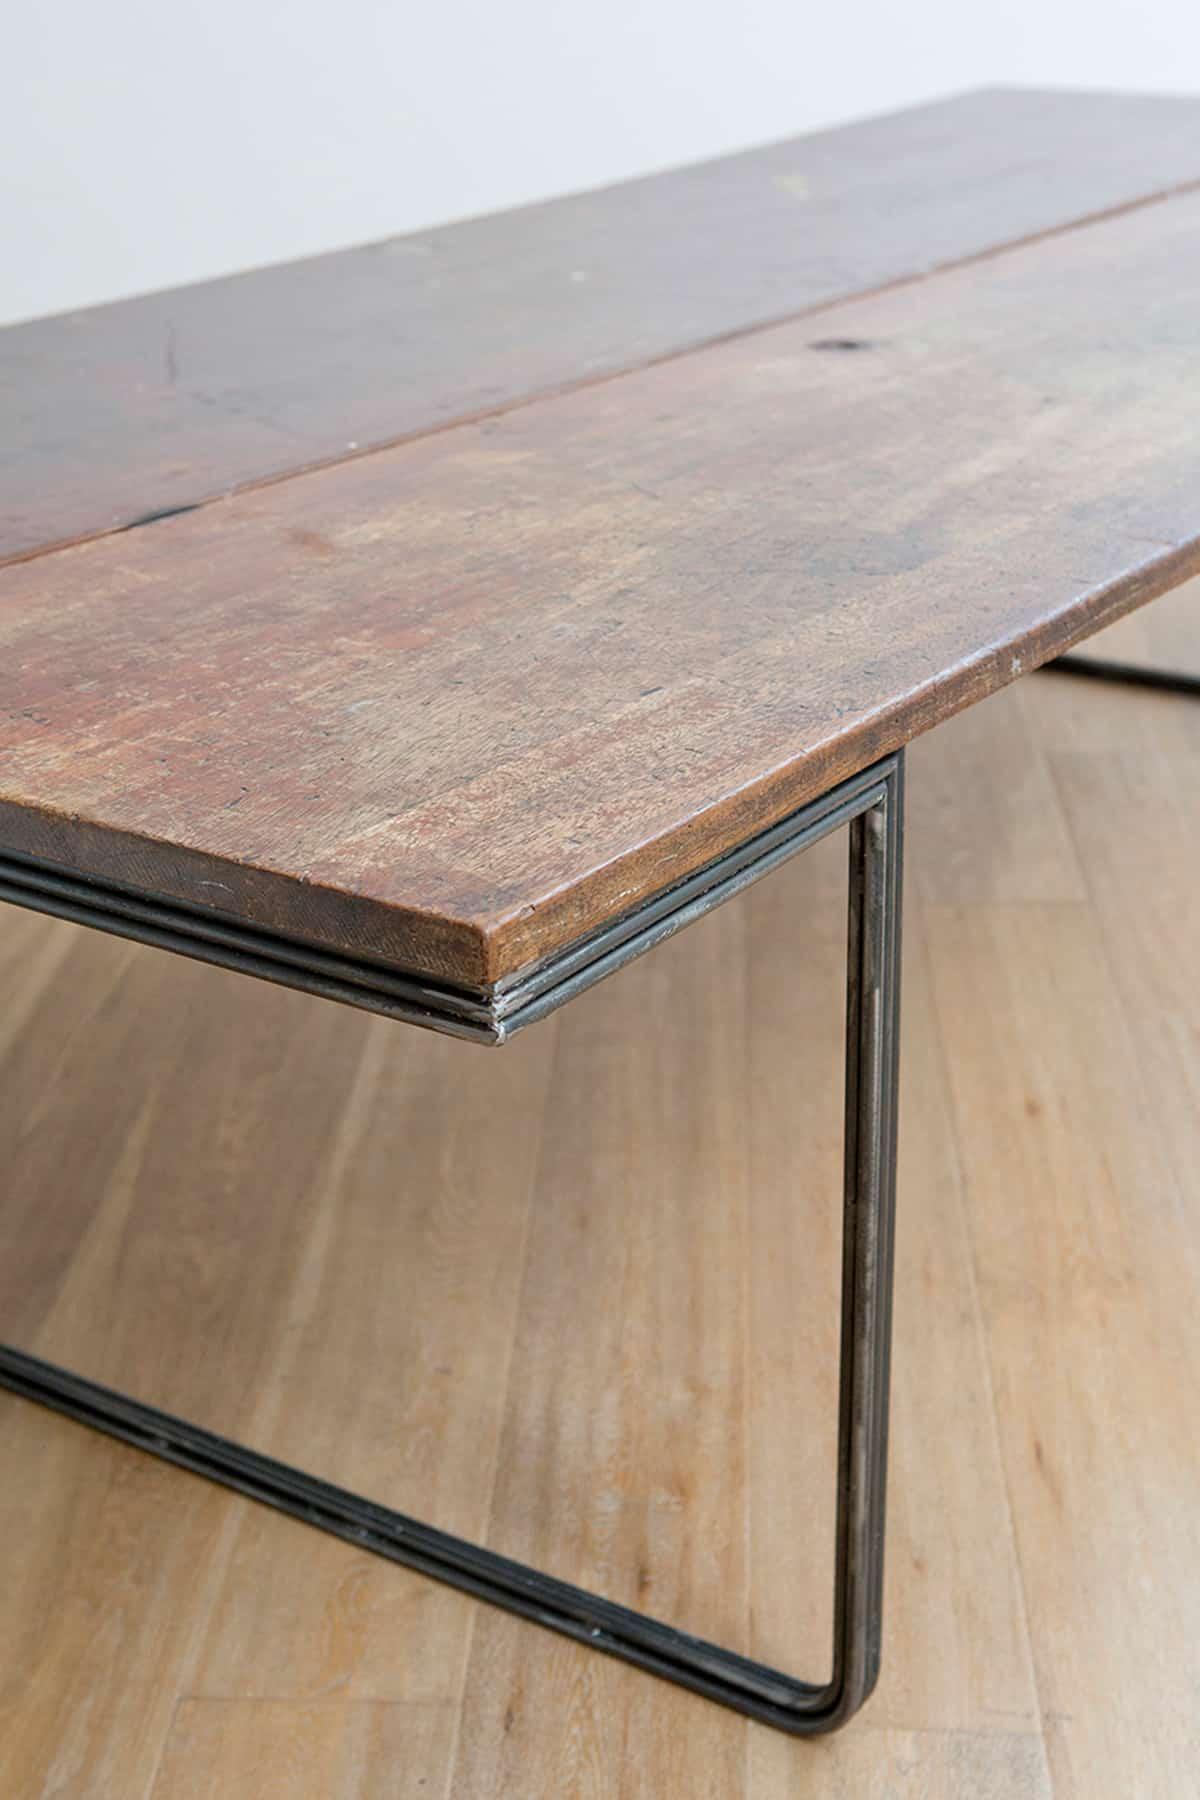 Archway Studios Furniture